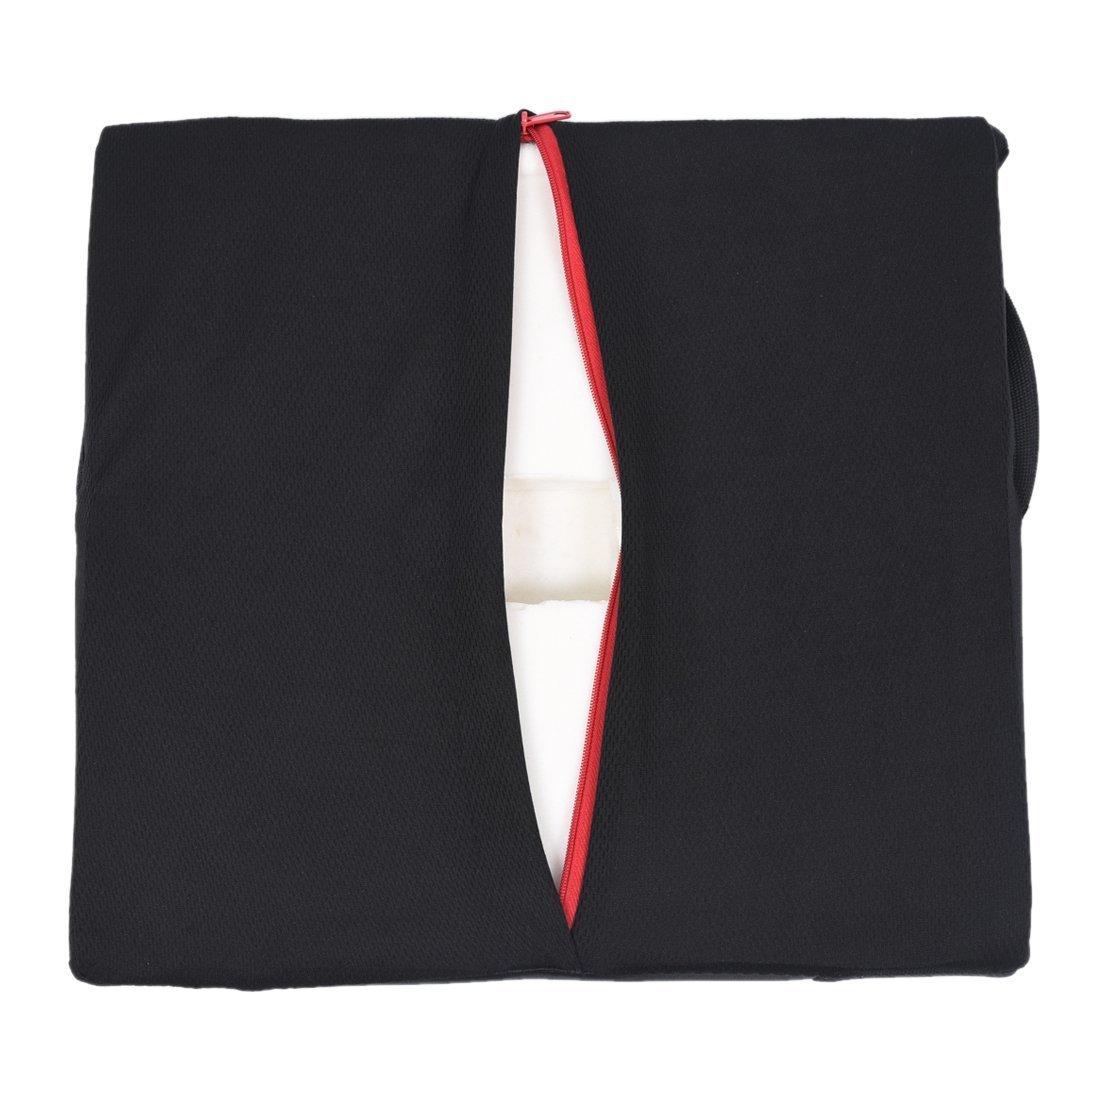 R Cojin de lumbar posterior Cojin trasero del coche para soporte de postura lumbar de masaje electrico 12V Negro TOOGOO